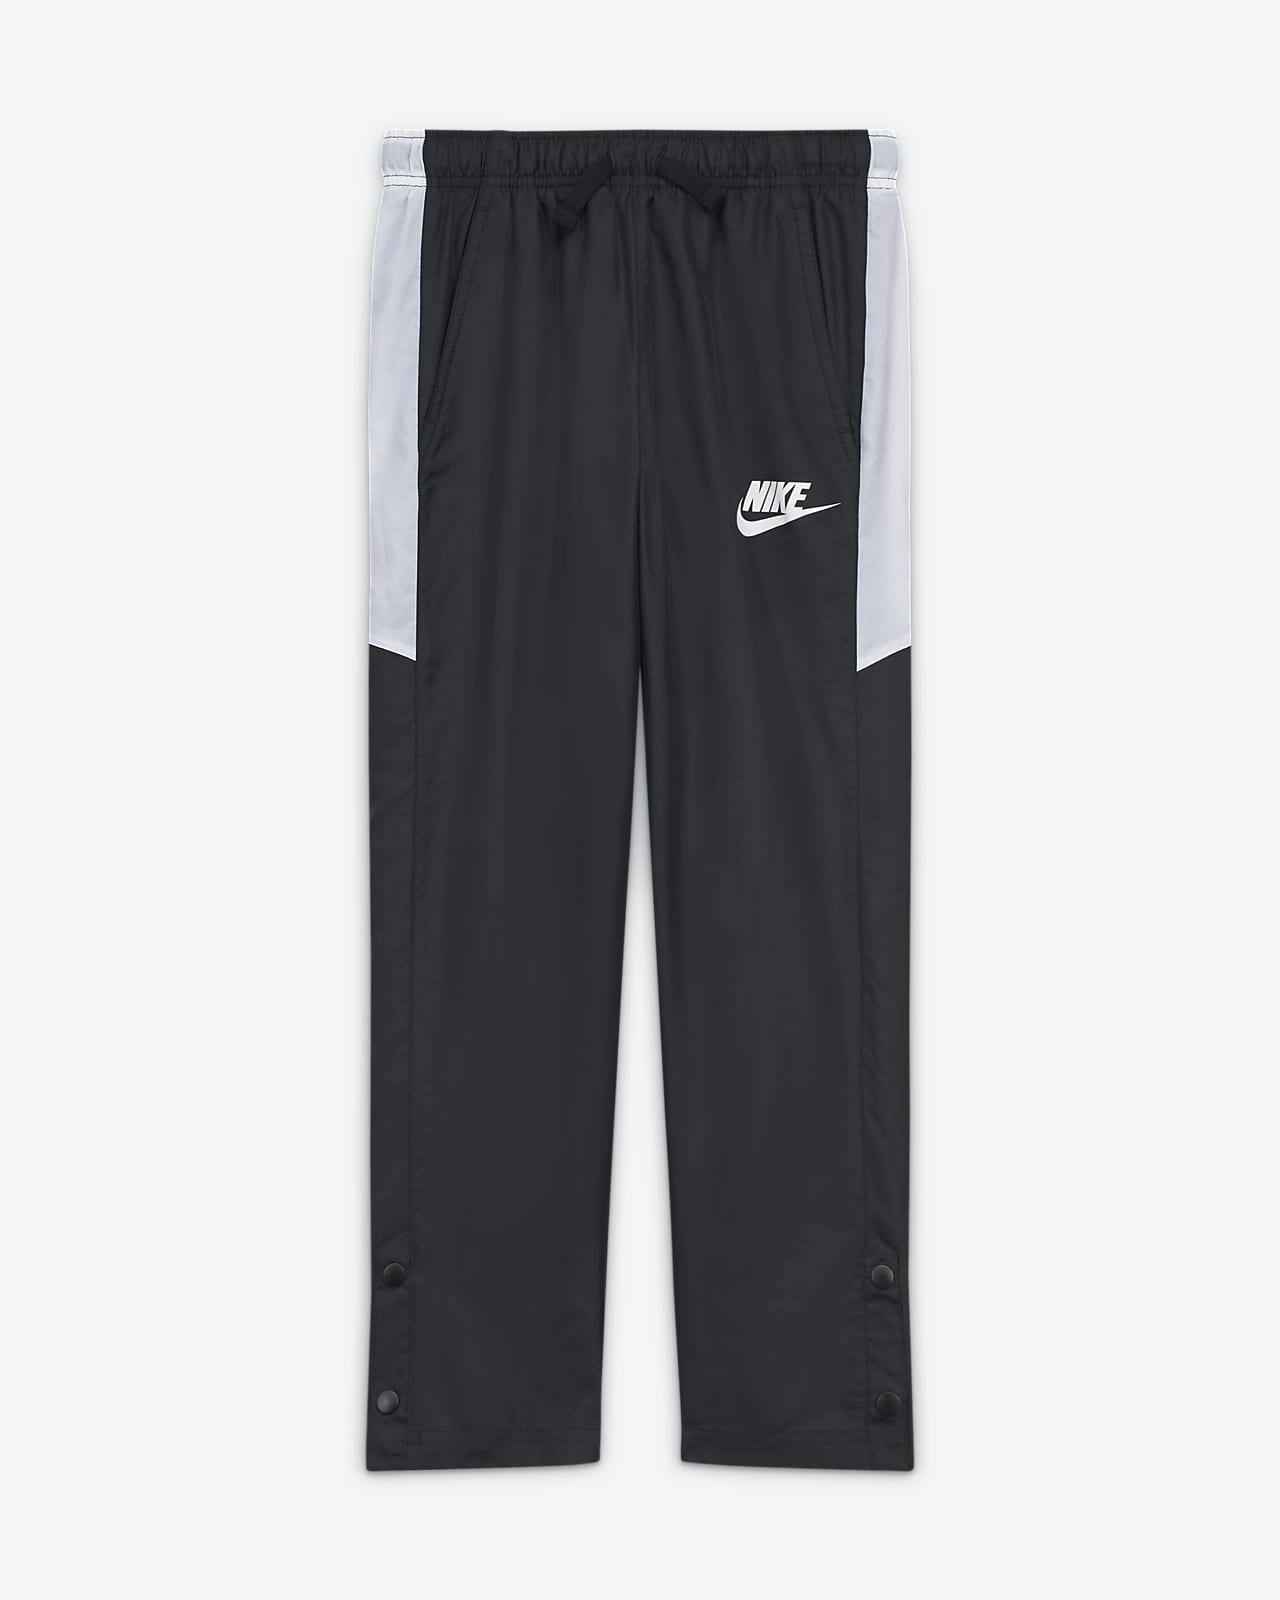 Брюки из тканого материала для мальчиков школьного возраста Nike Sportswear